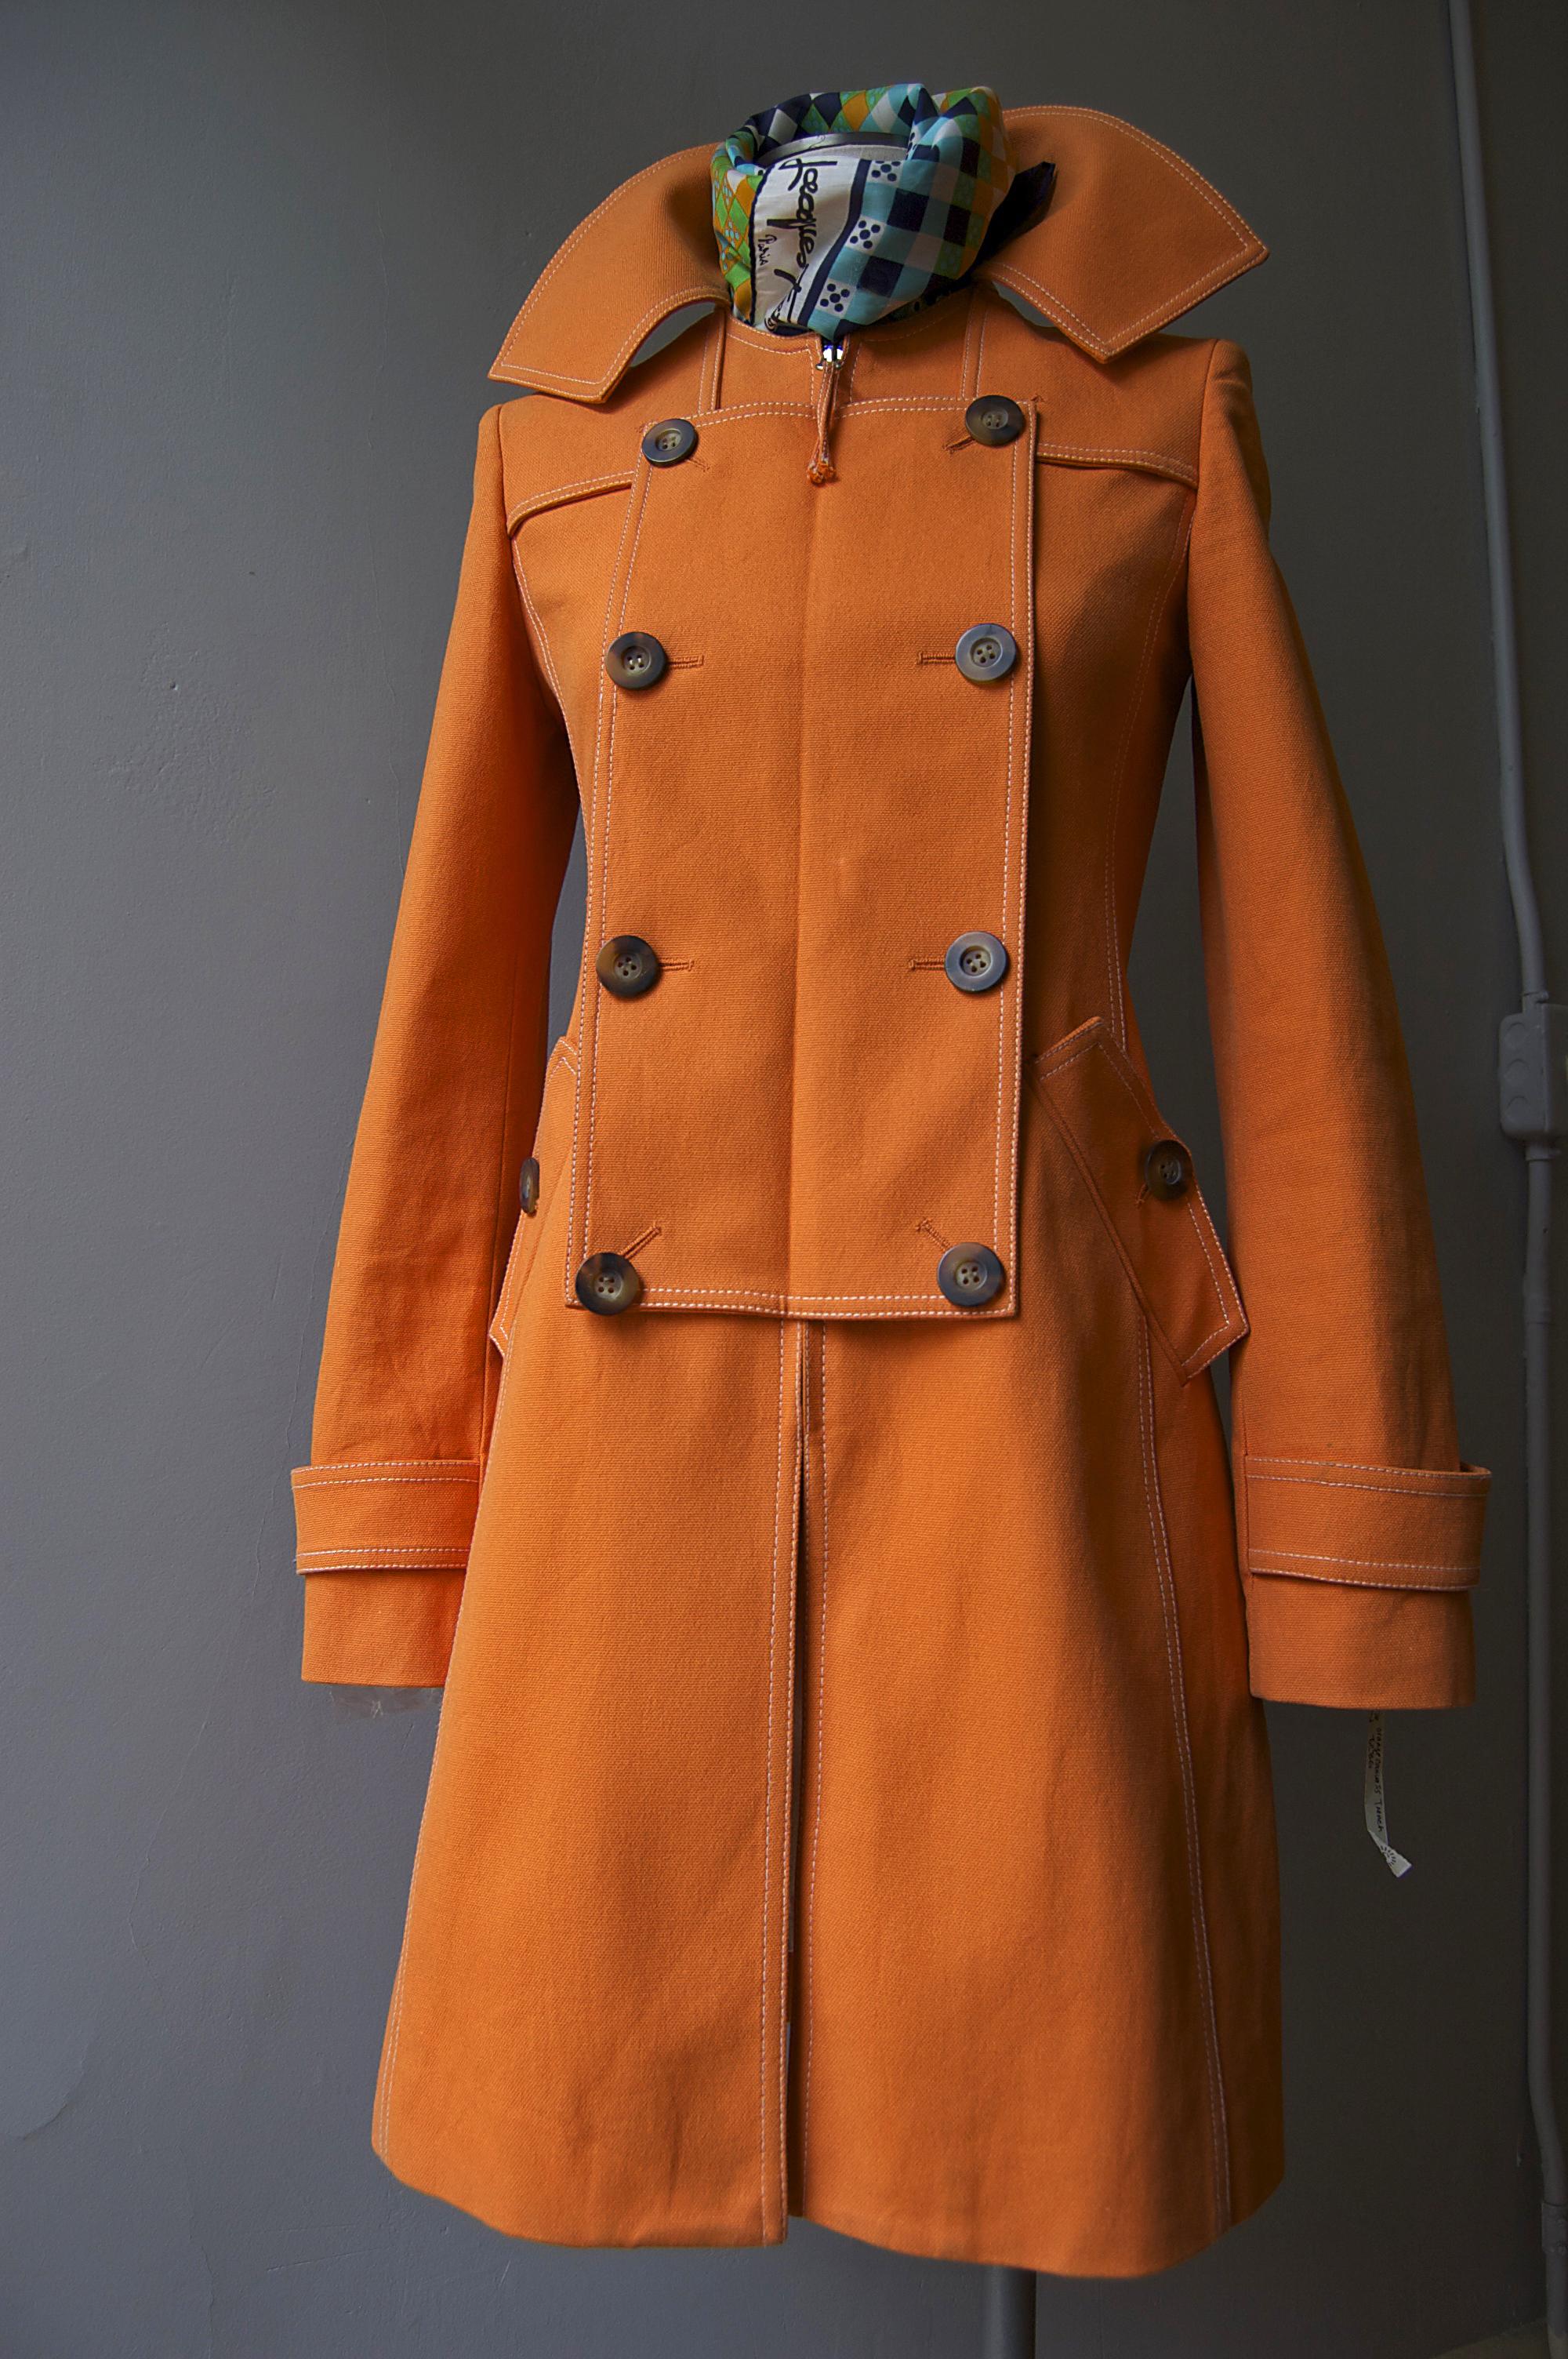 orangeraincoat.jpg